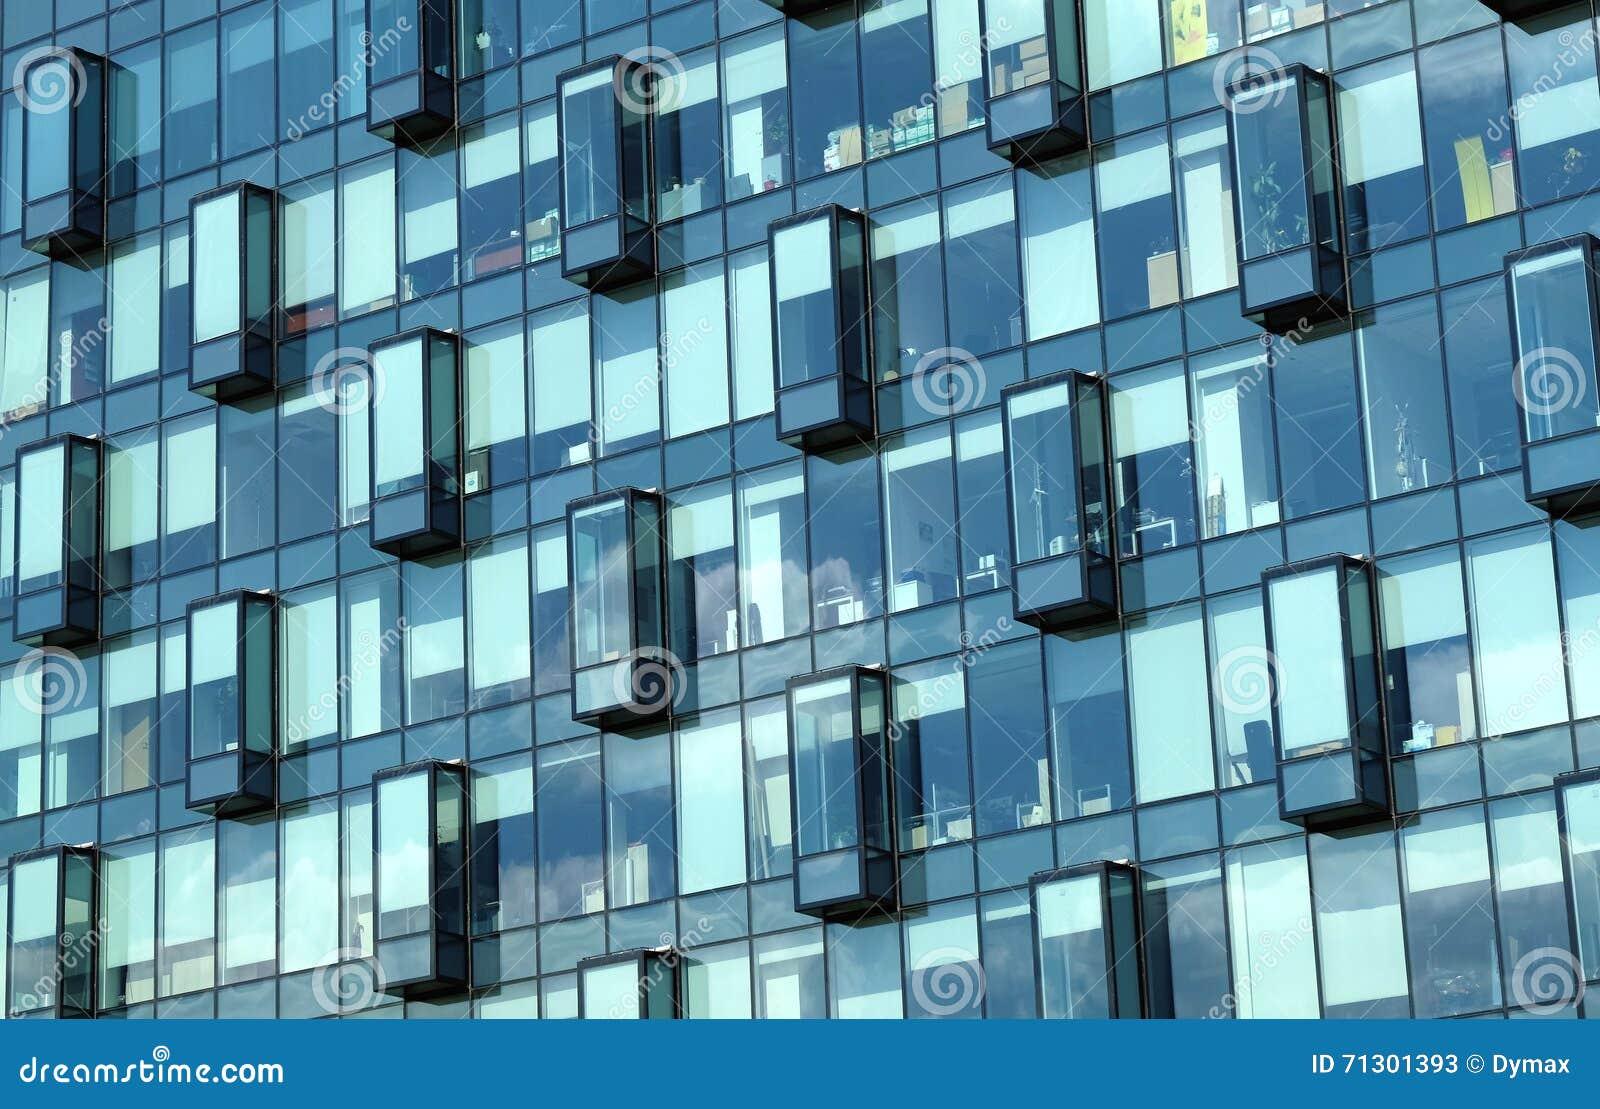 Fa ade de vue de face de bureaux de mur de verre moderne d for Immeuble bureau moderne